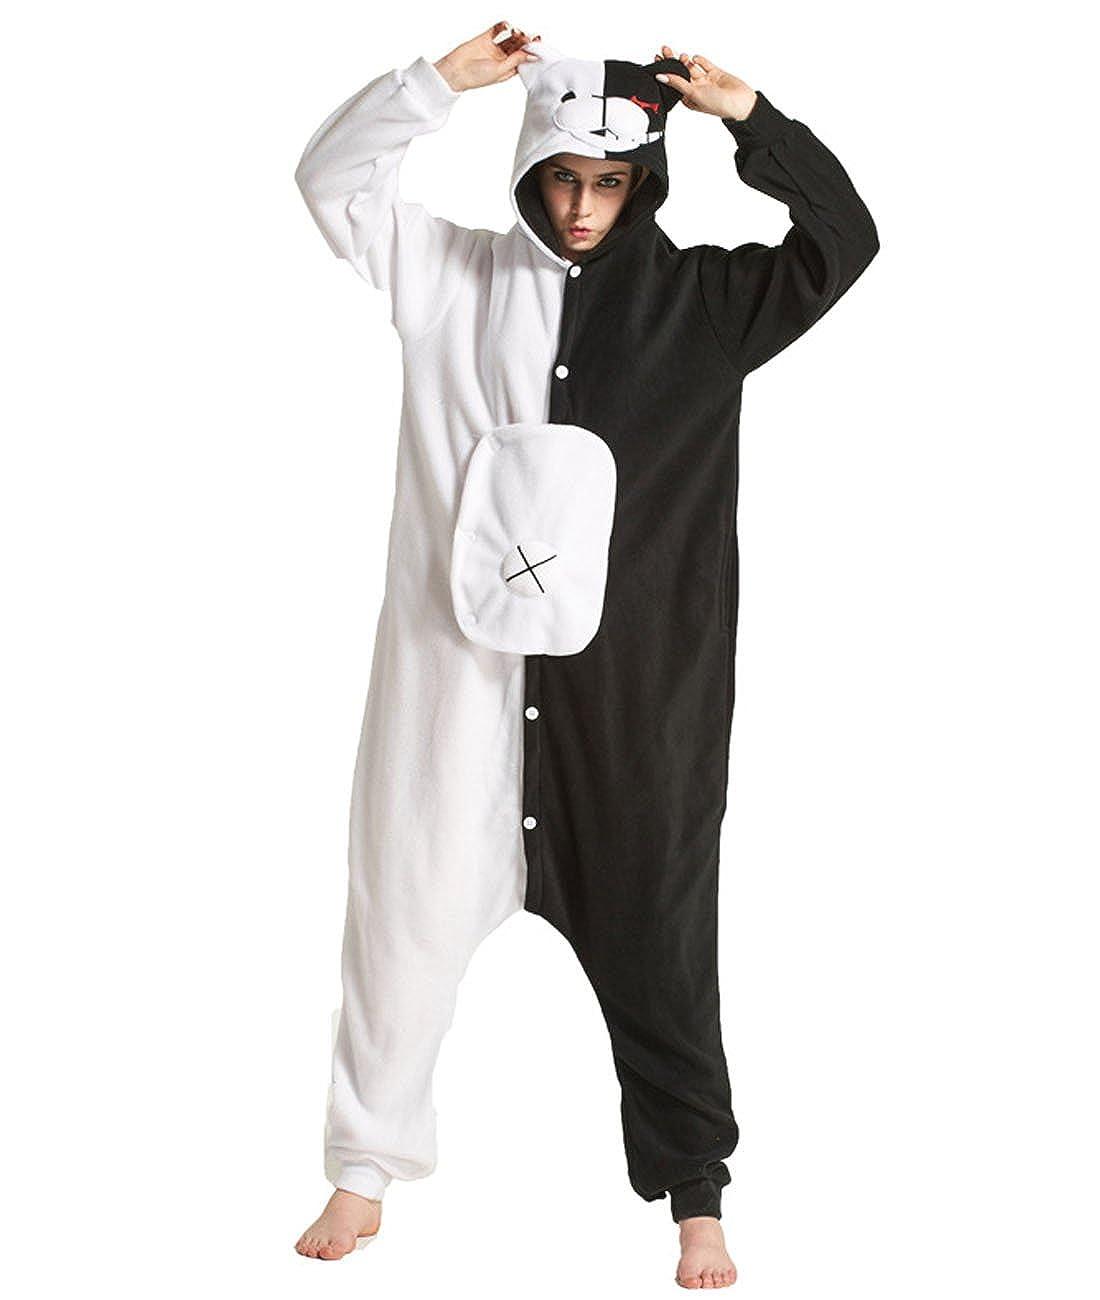 Yimidear Cosplay Pigiama Adulto Donna Uomo Cosplay Pigiama Animale Halloween Costume Attrezzatura